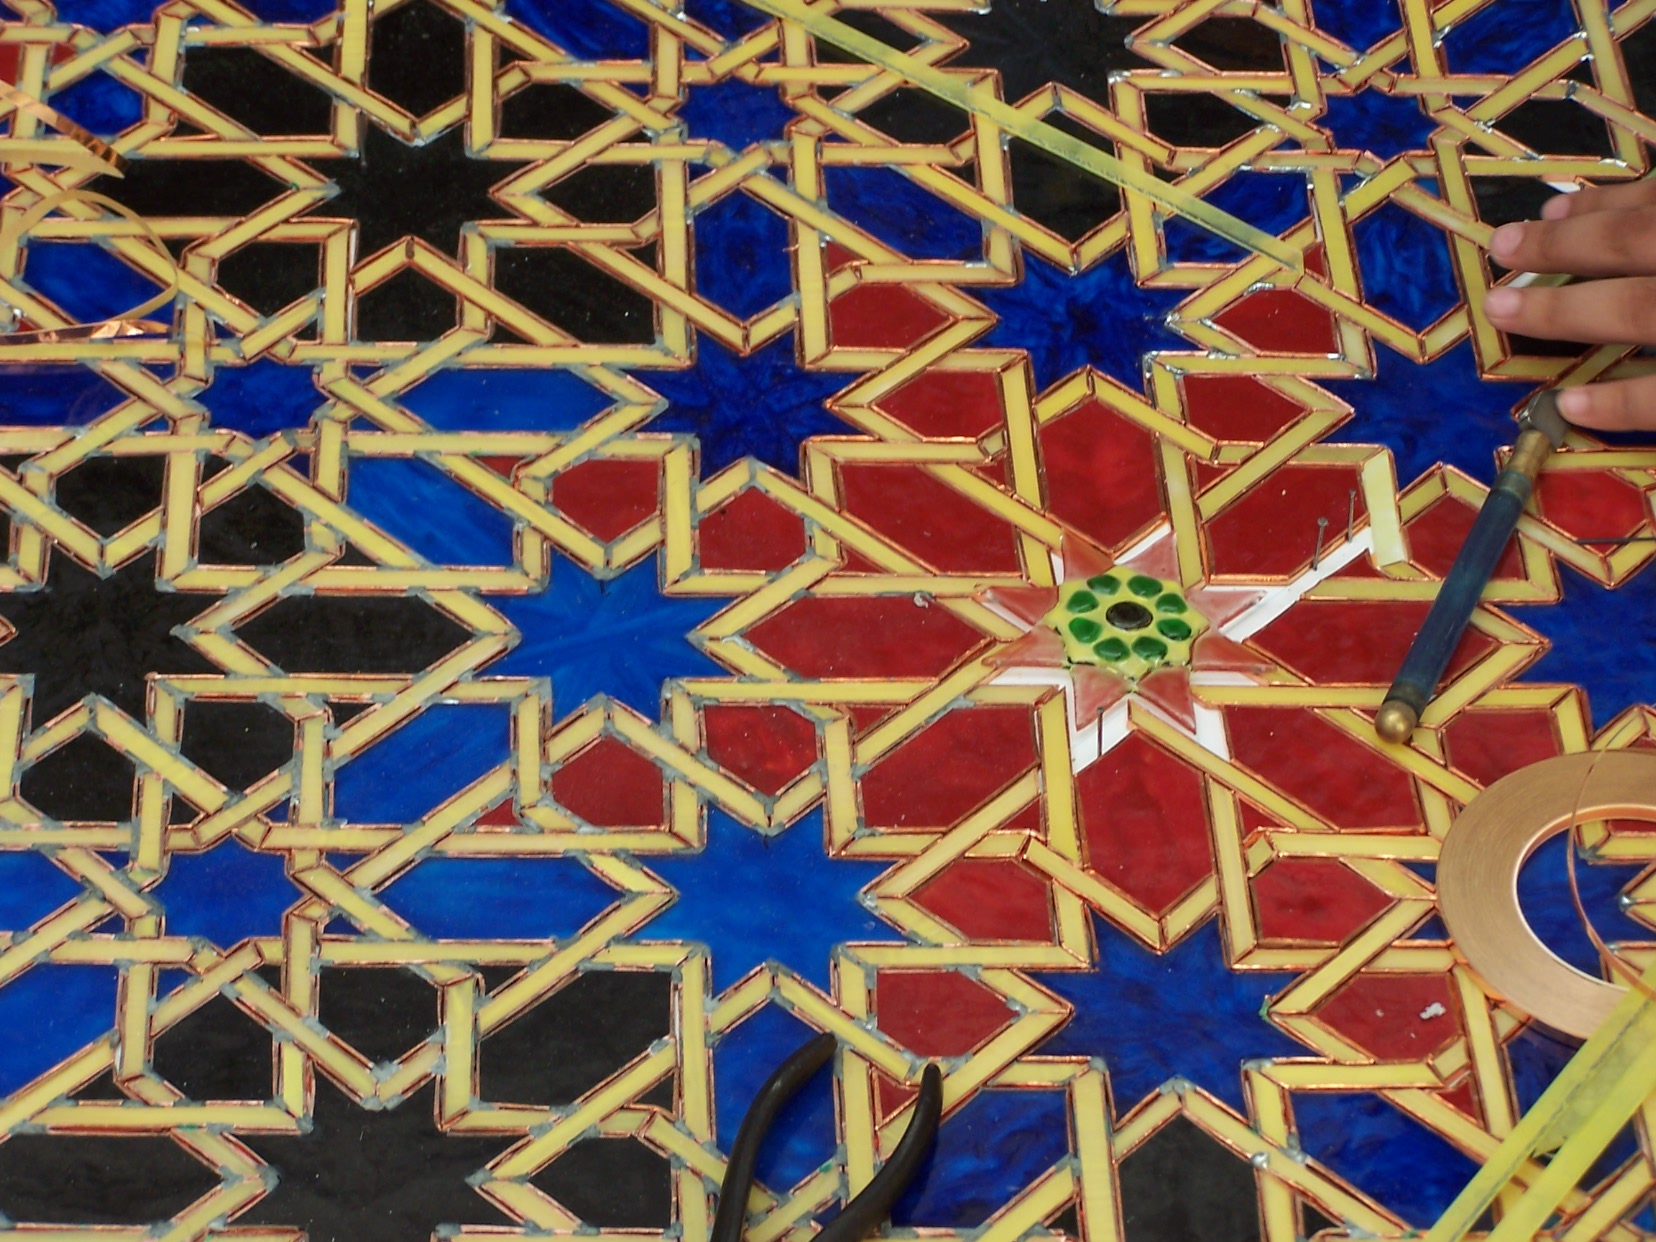 Decorazione geometrica